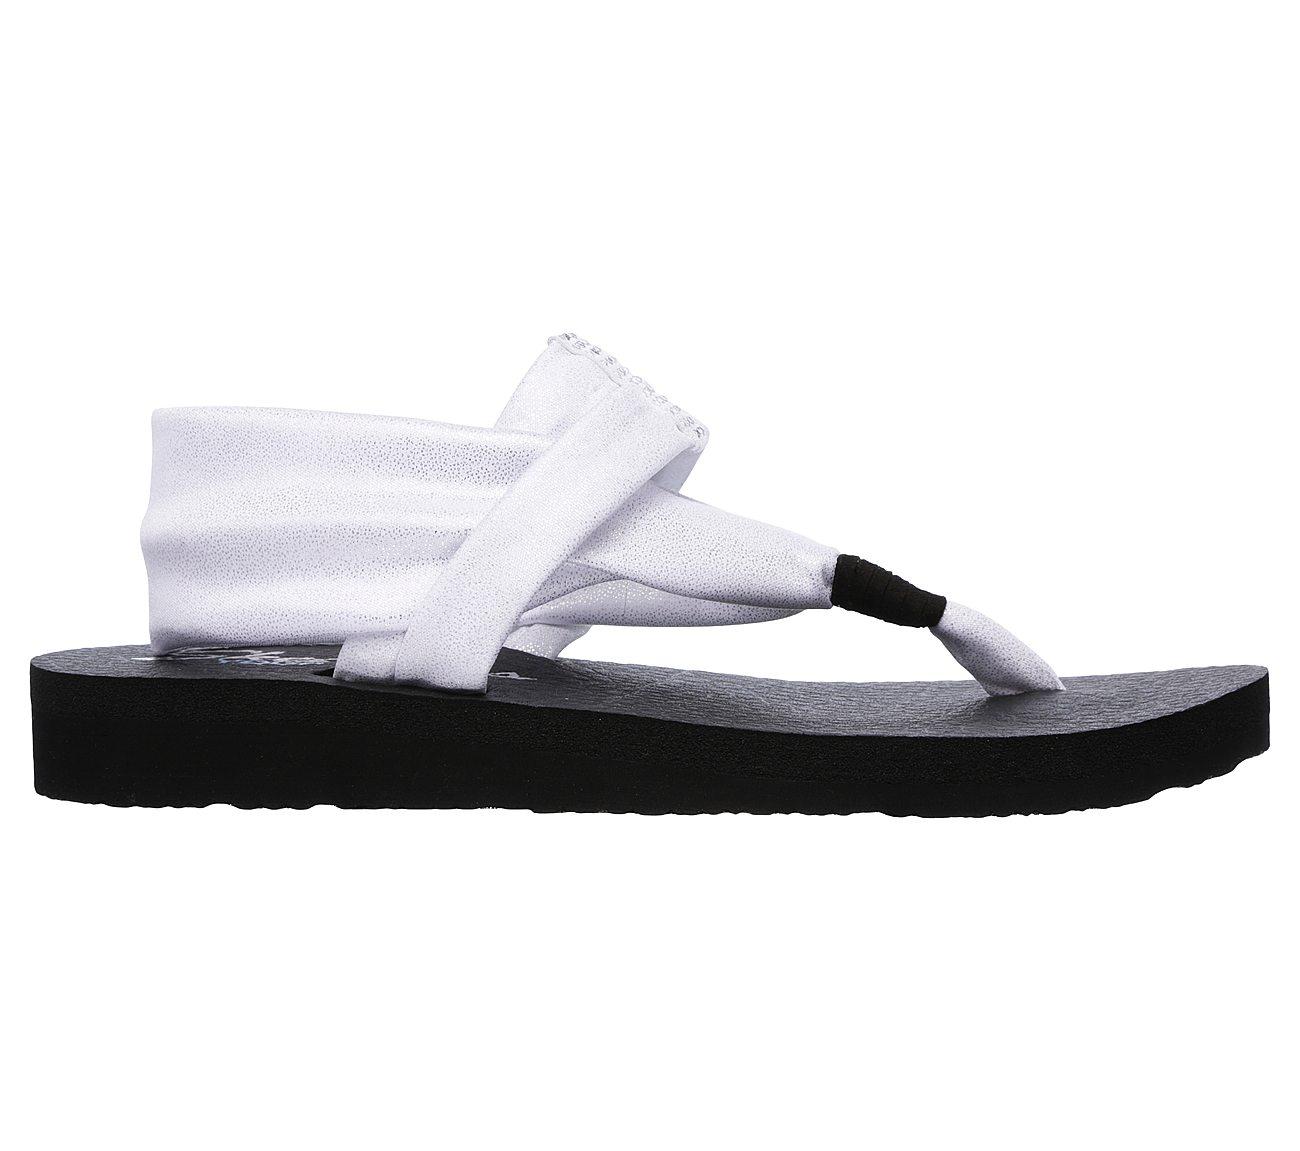 d5b366048a2c Buy SKECHERS Meditation - Disco SKECHERS Cali Shoes only £29.00